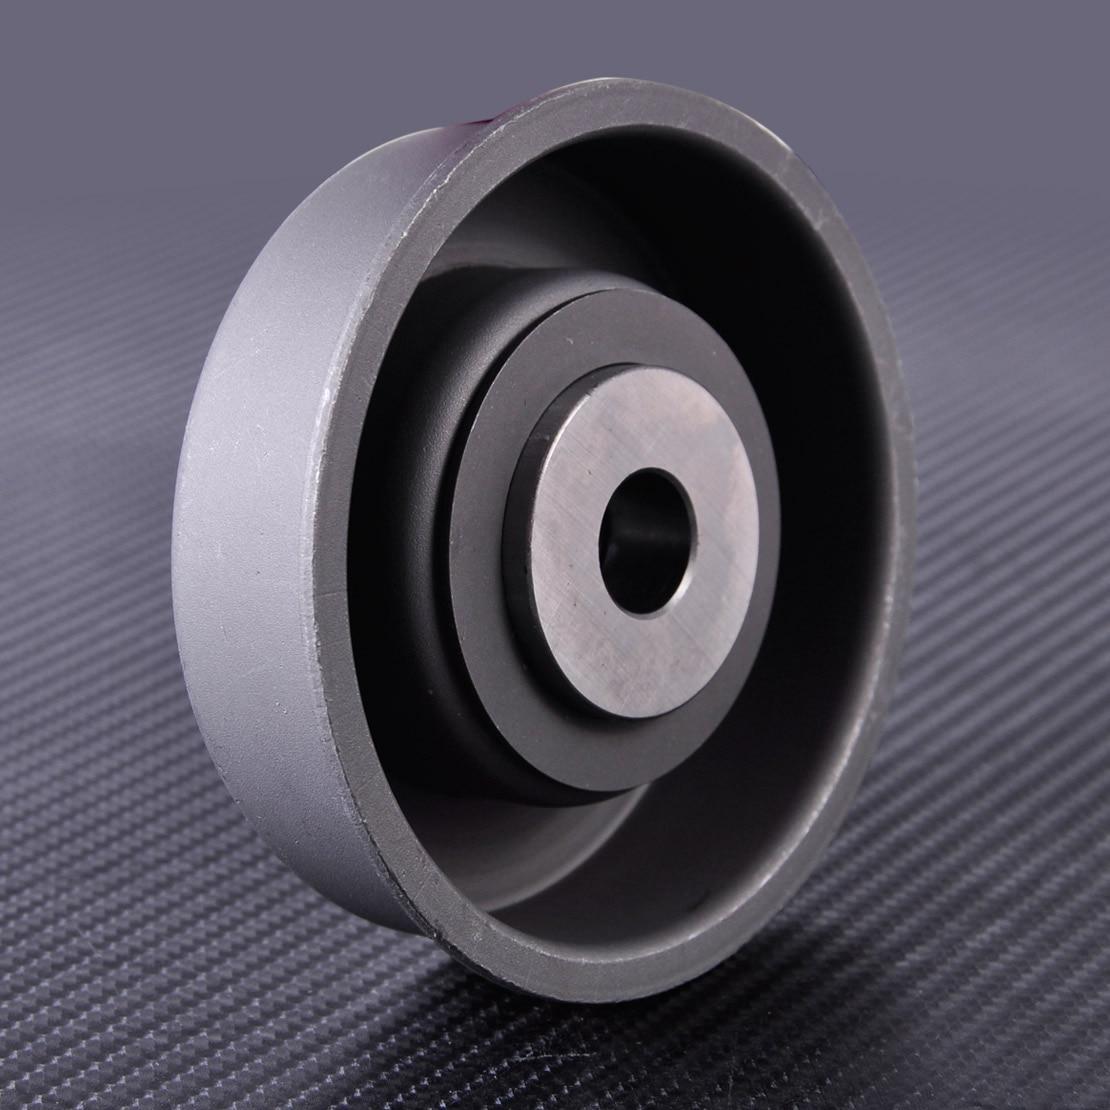 Citall belt tensioner pulley md308882 for mitsubishi lancer galant montero diamante dodge raider ram hyundai sonata